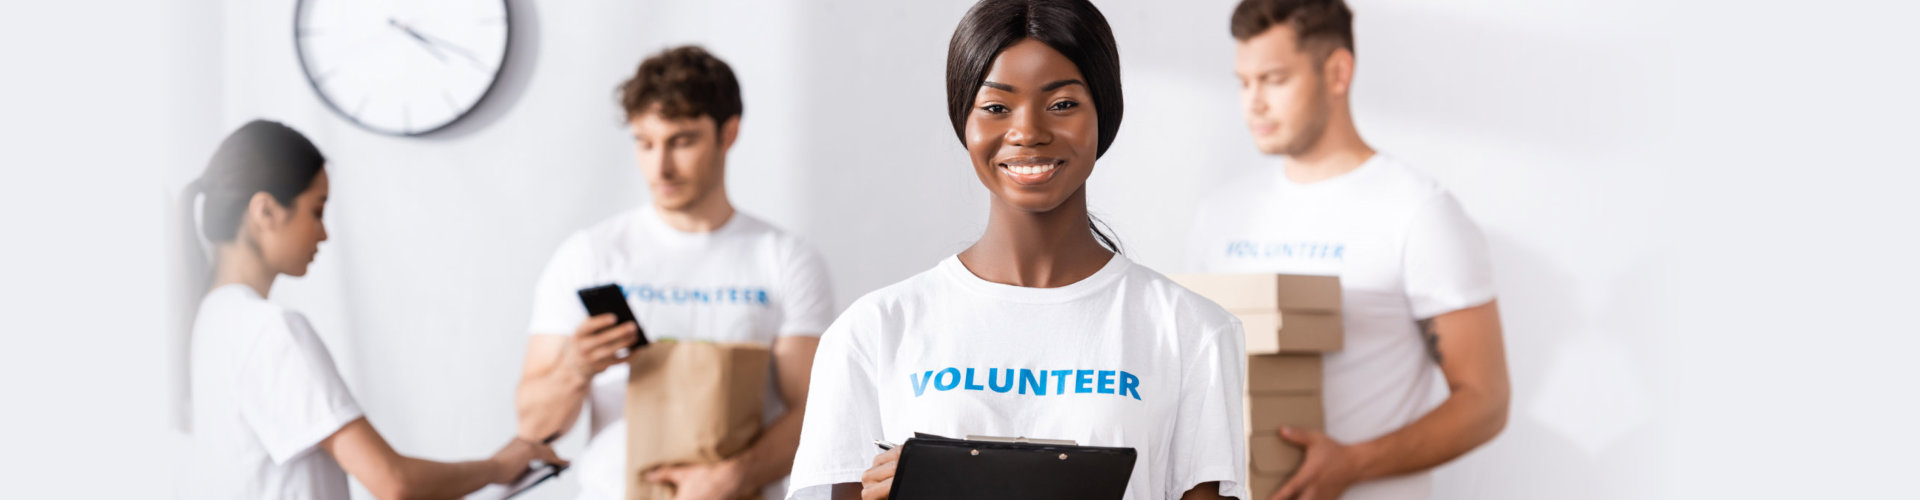 volunteer holding clipboard